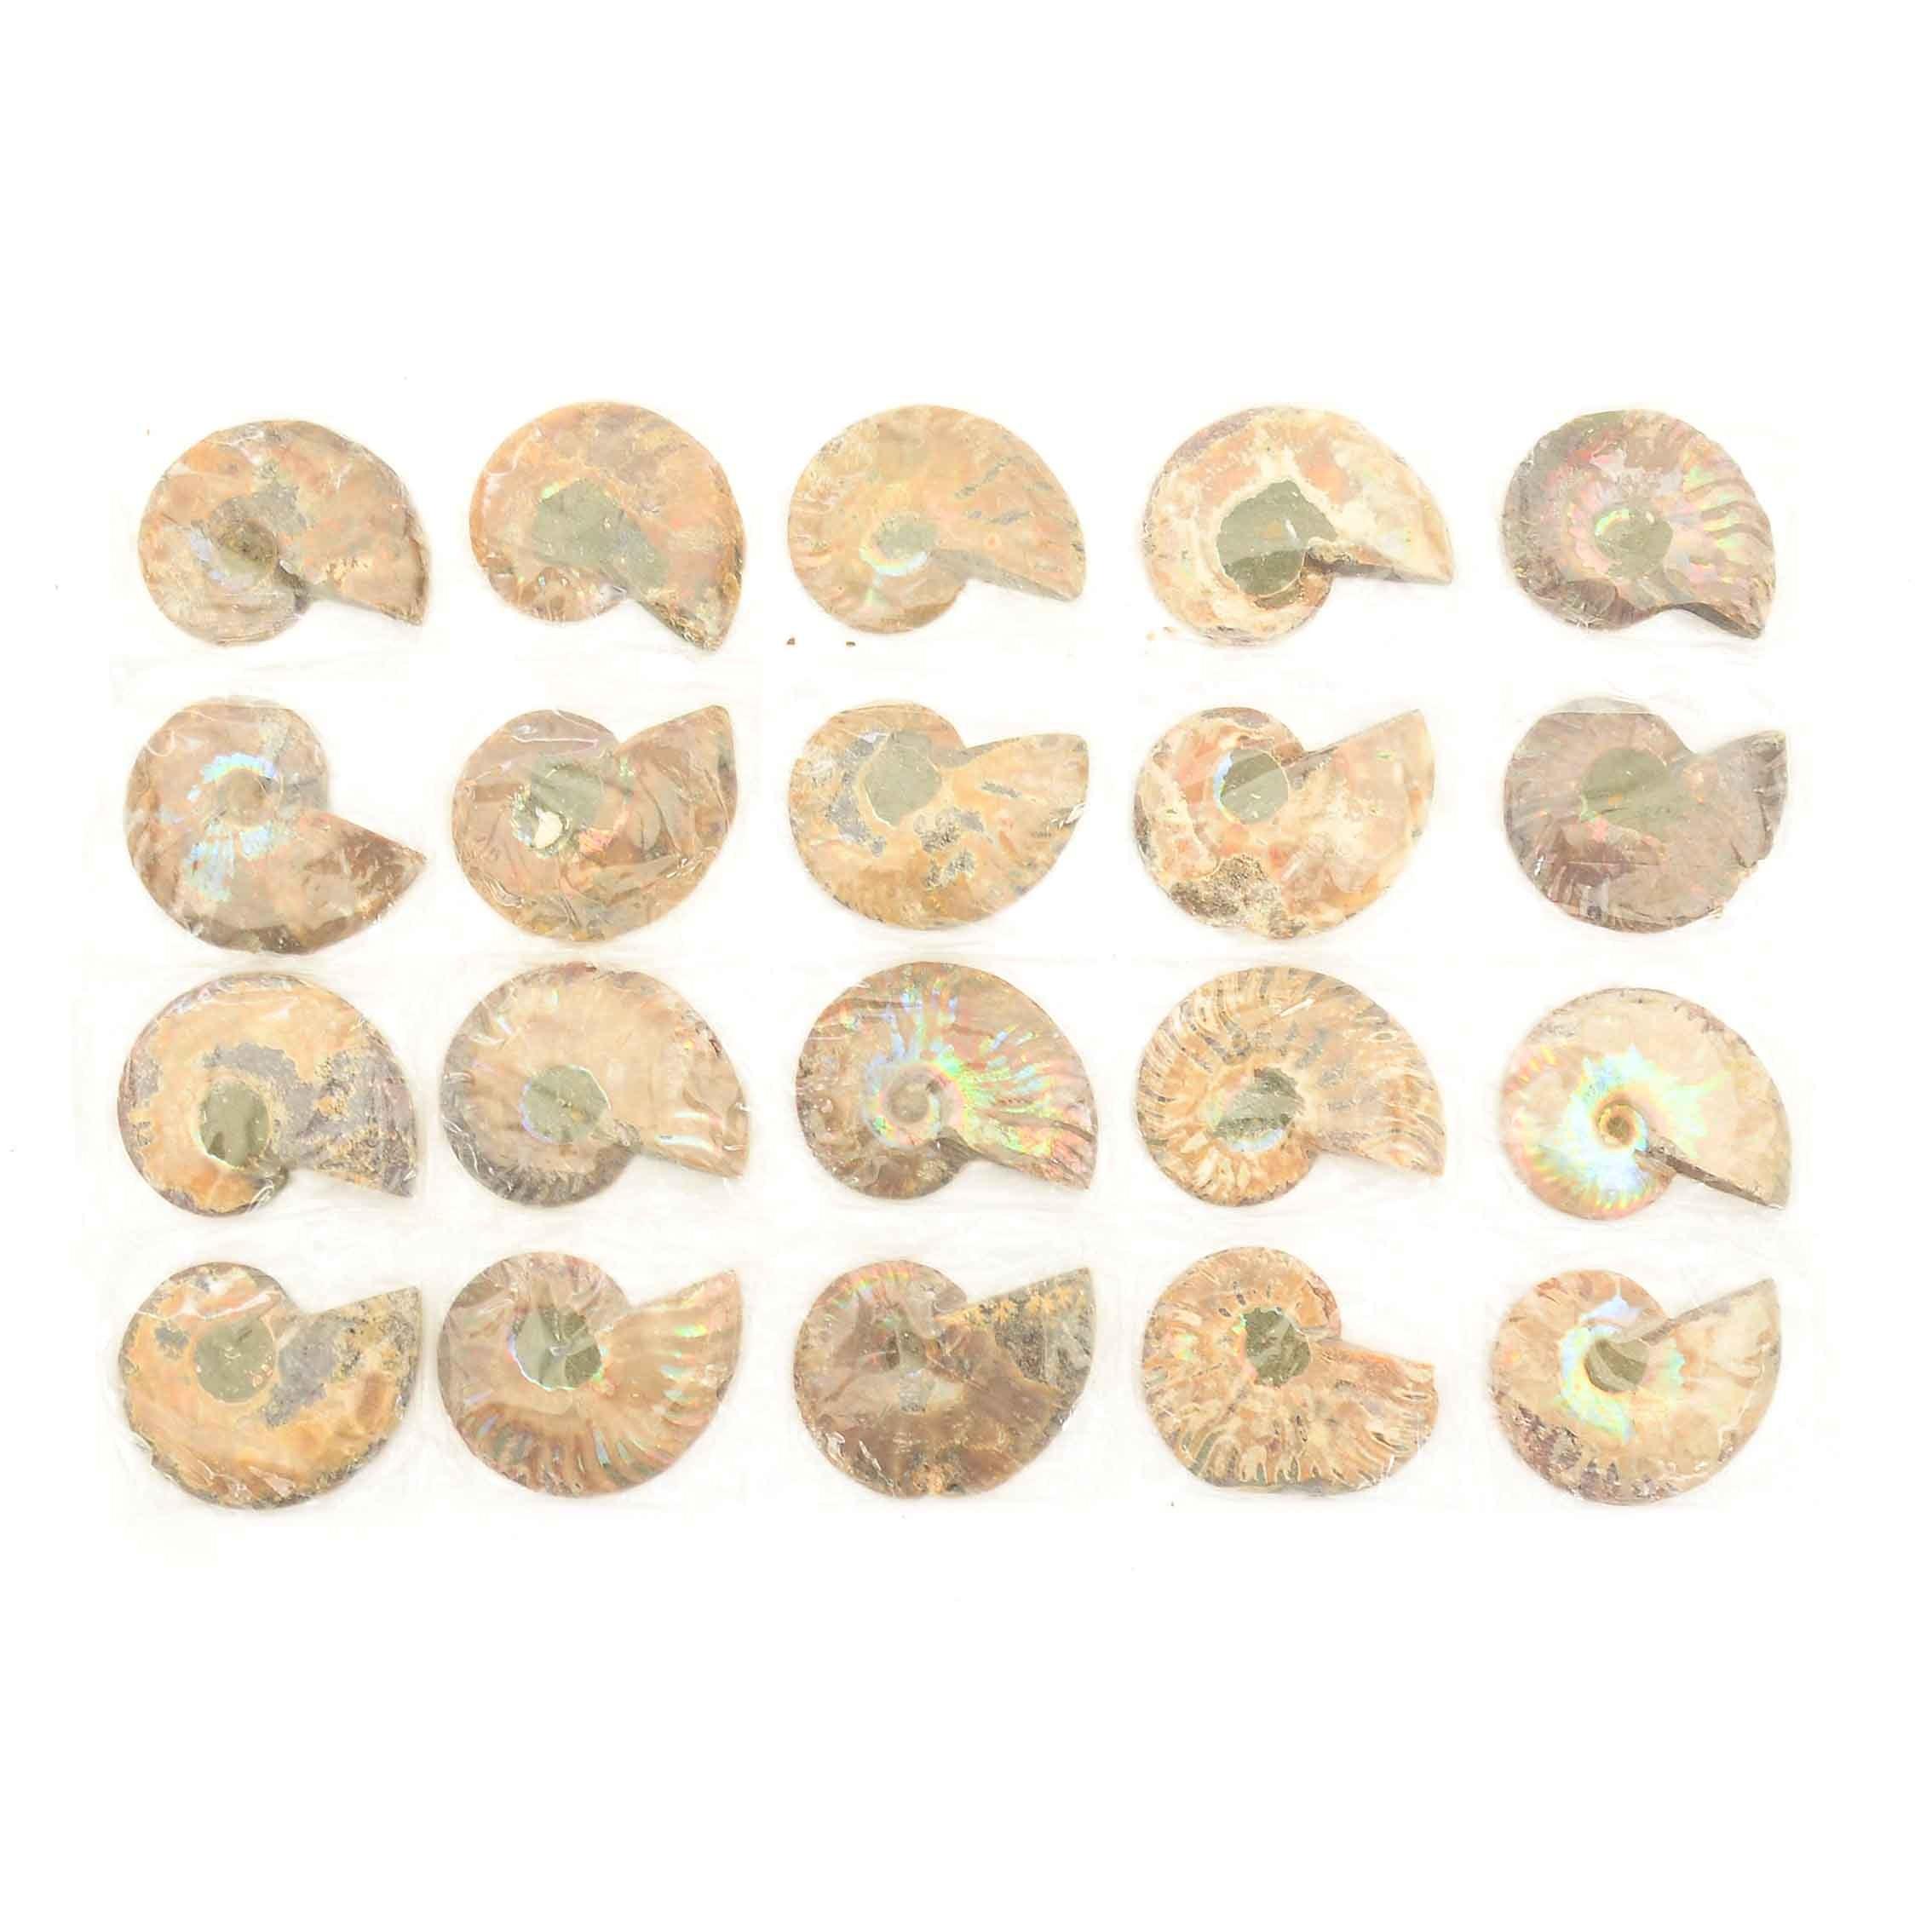 Coiled Ammonoid Specimens